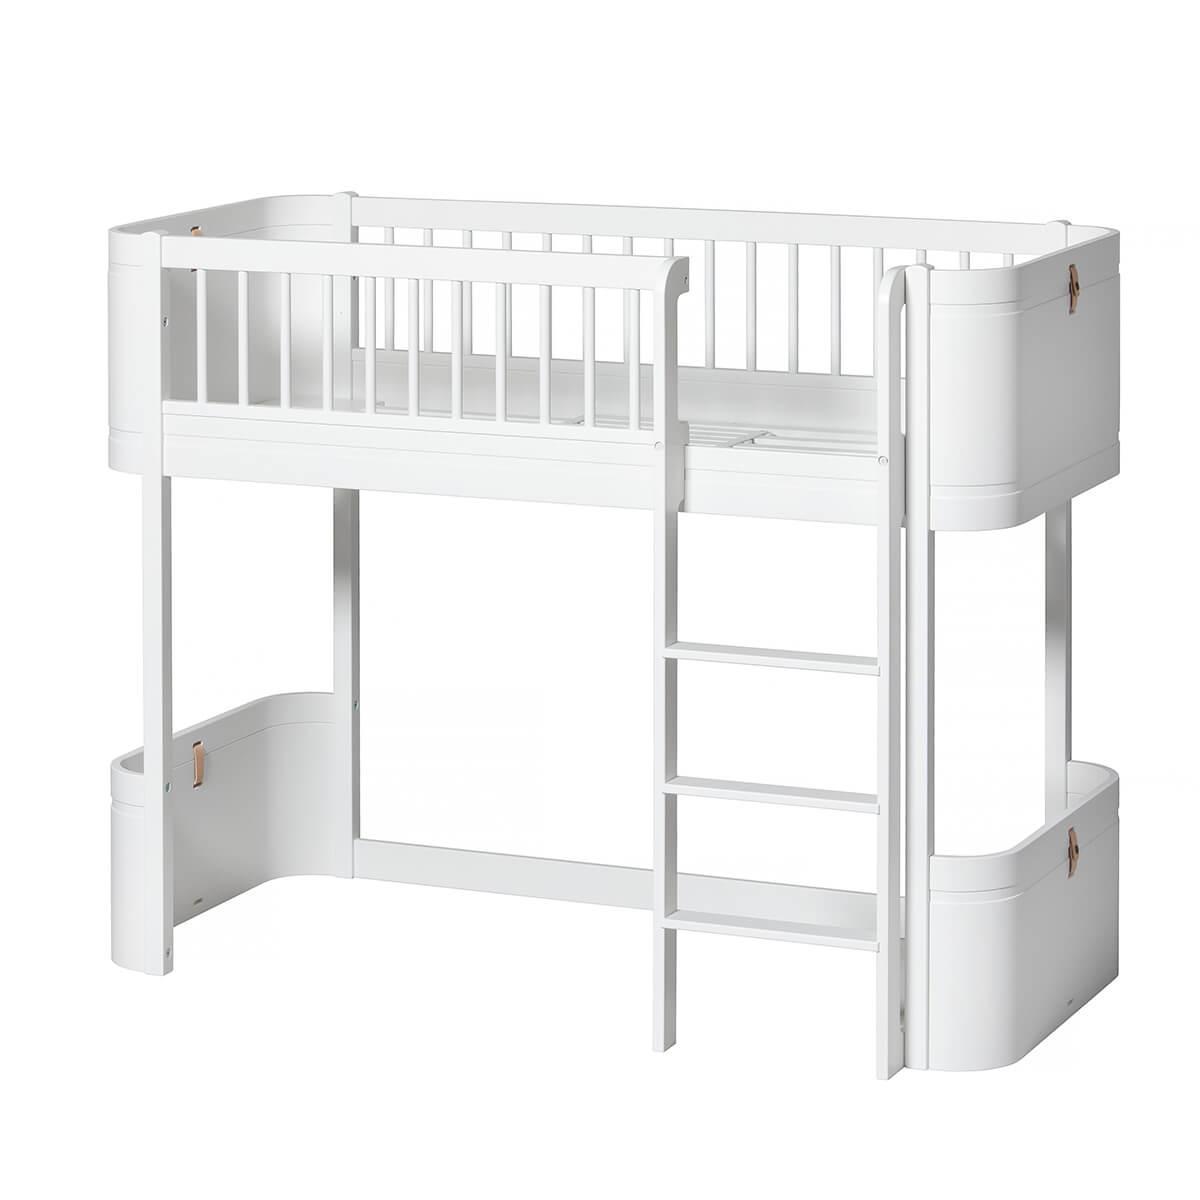 Cama evolutiva media alta 68x162cm WOOD MINI+ Oliver Furniture blanco